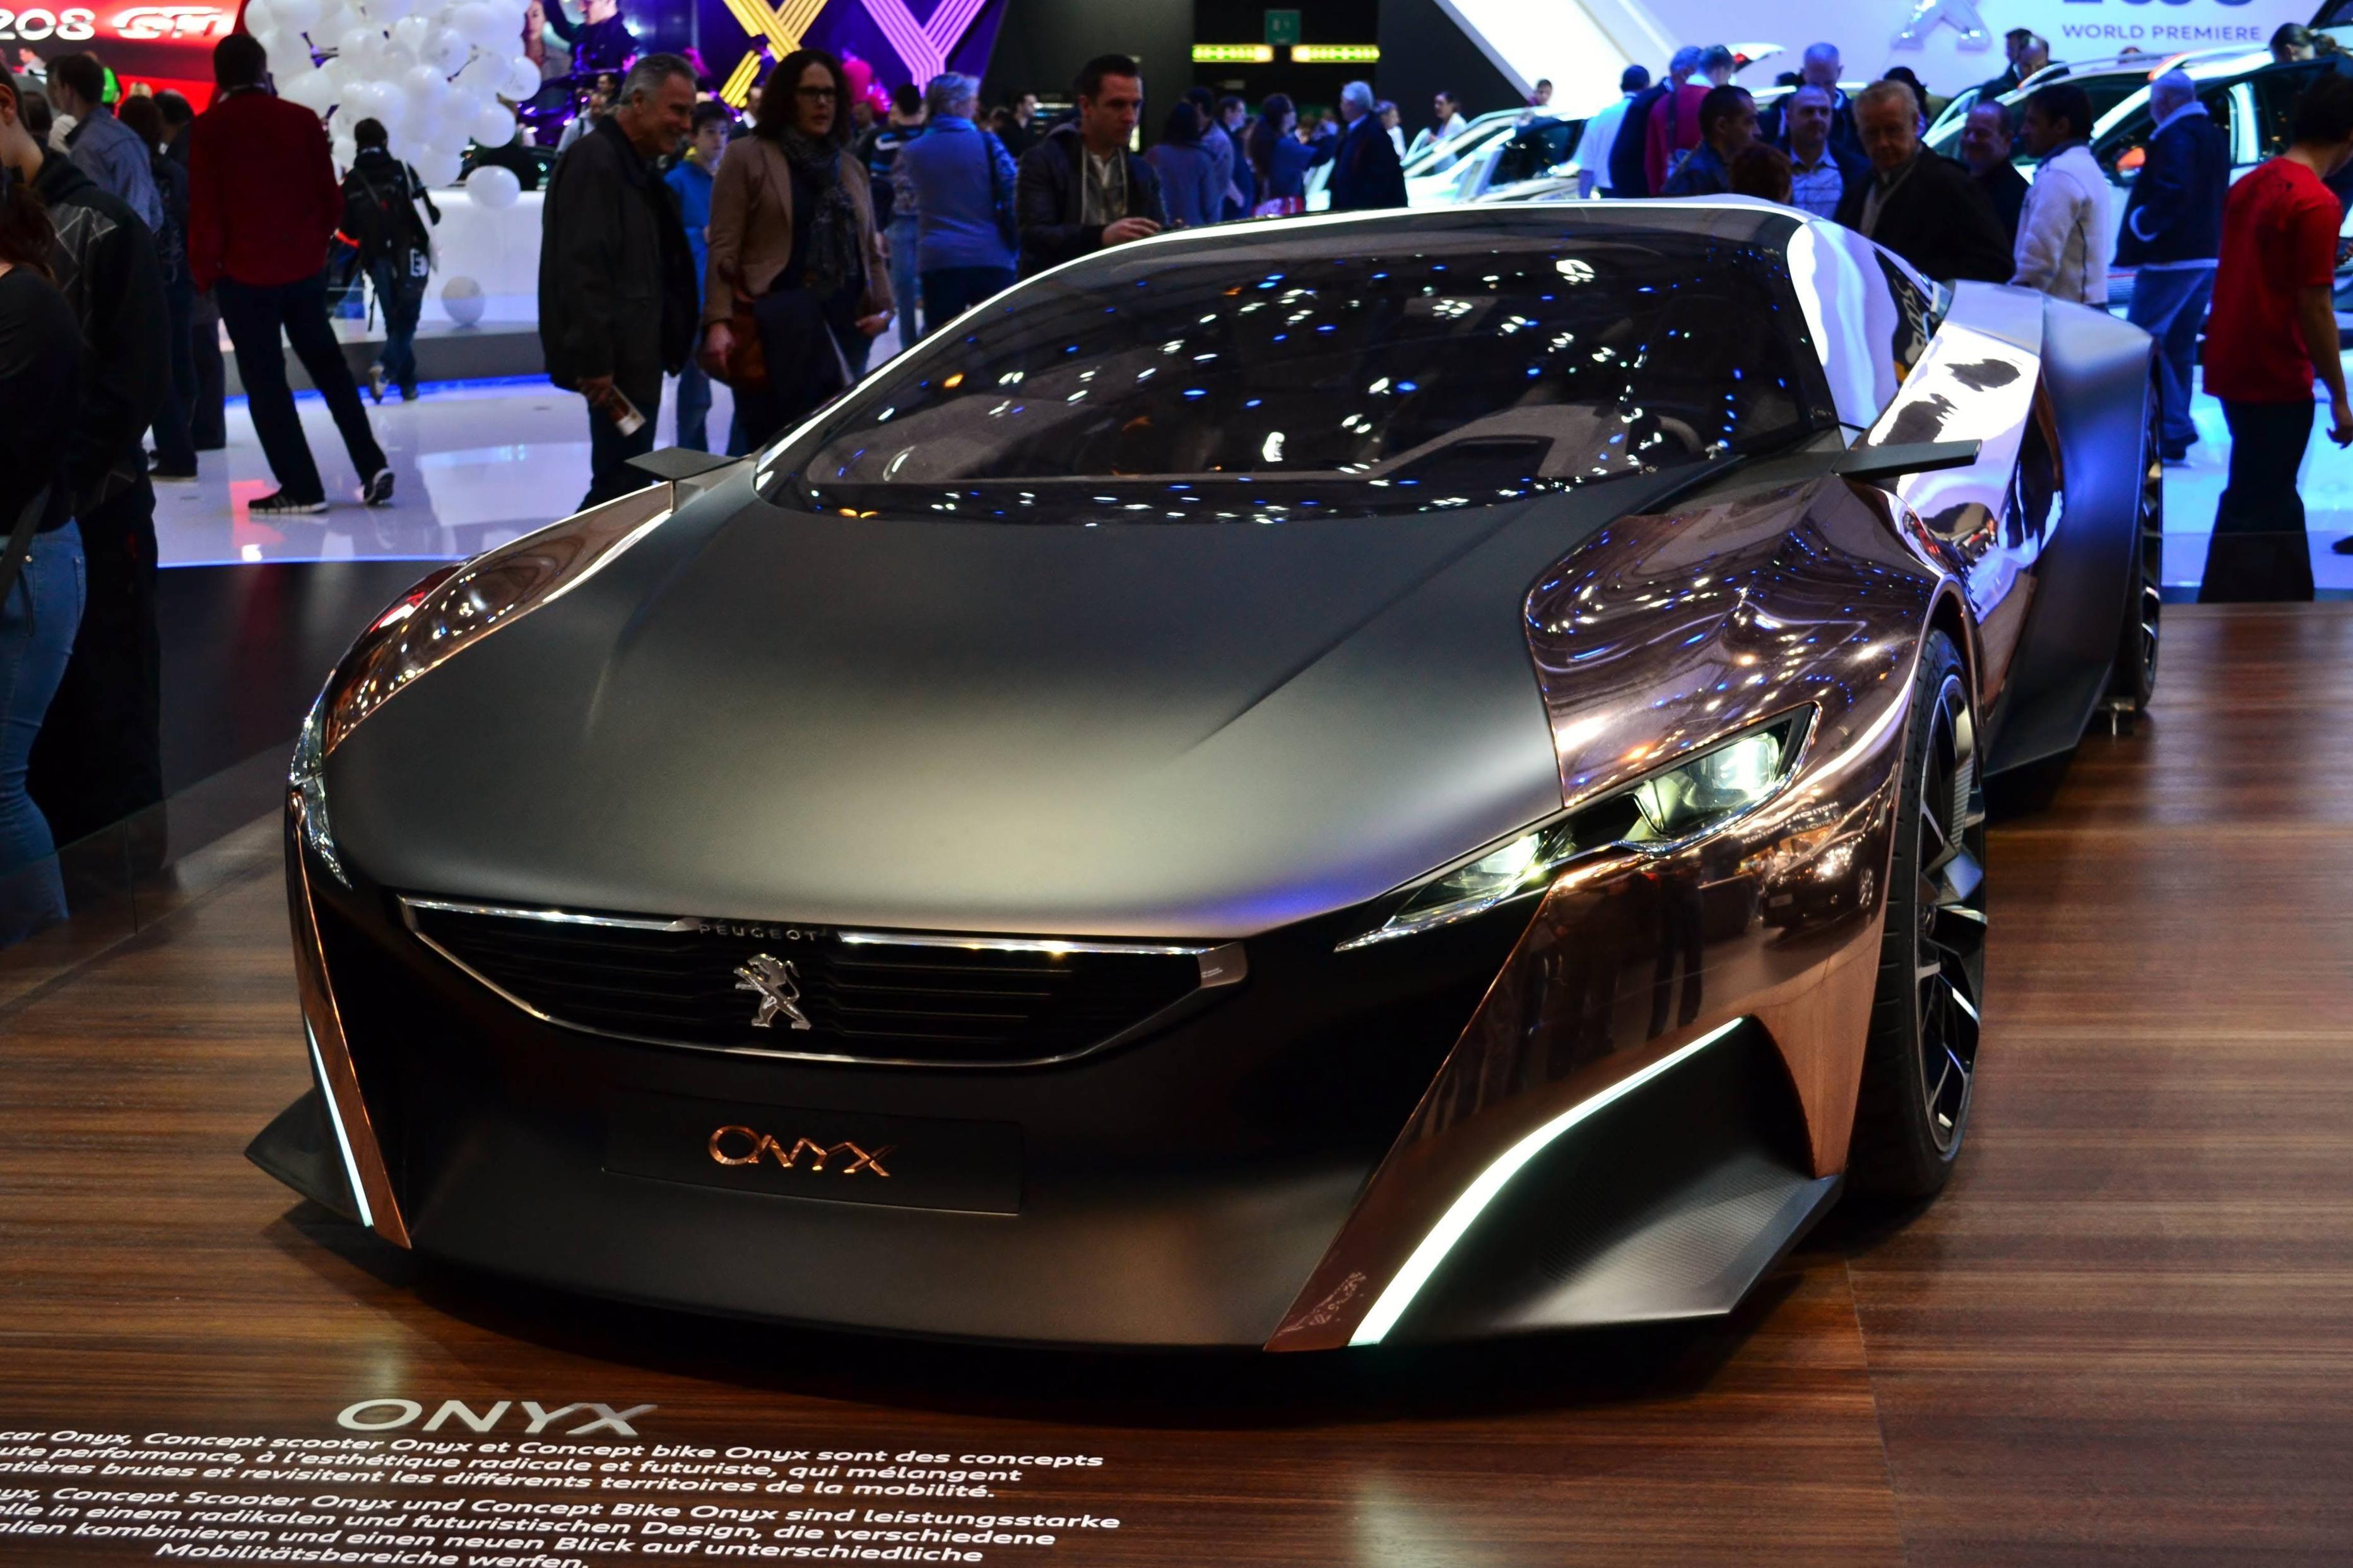 Peugeot Onyx (concept) Geneva motor show 2013 [4604x3068